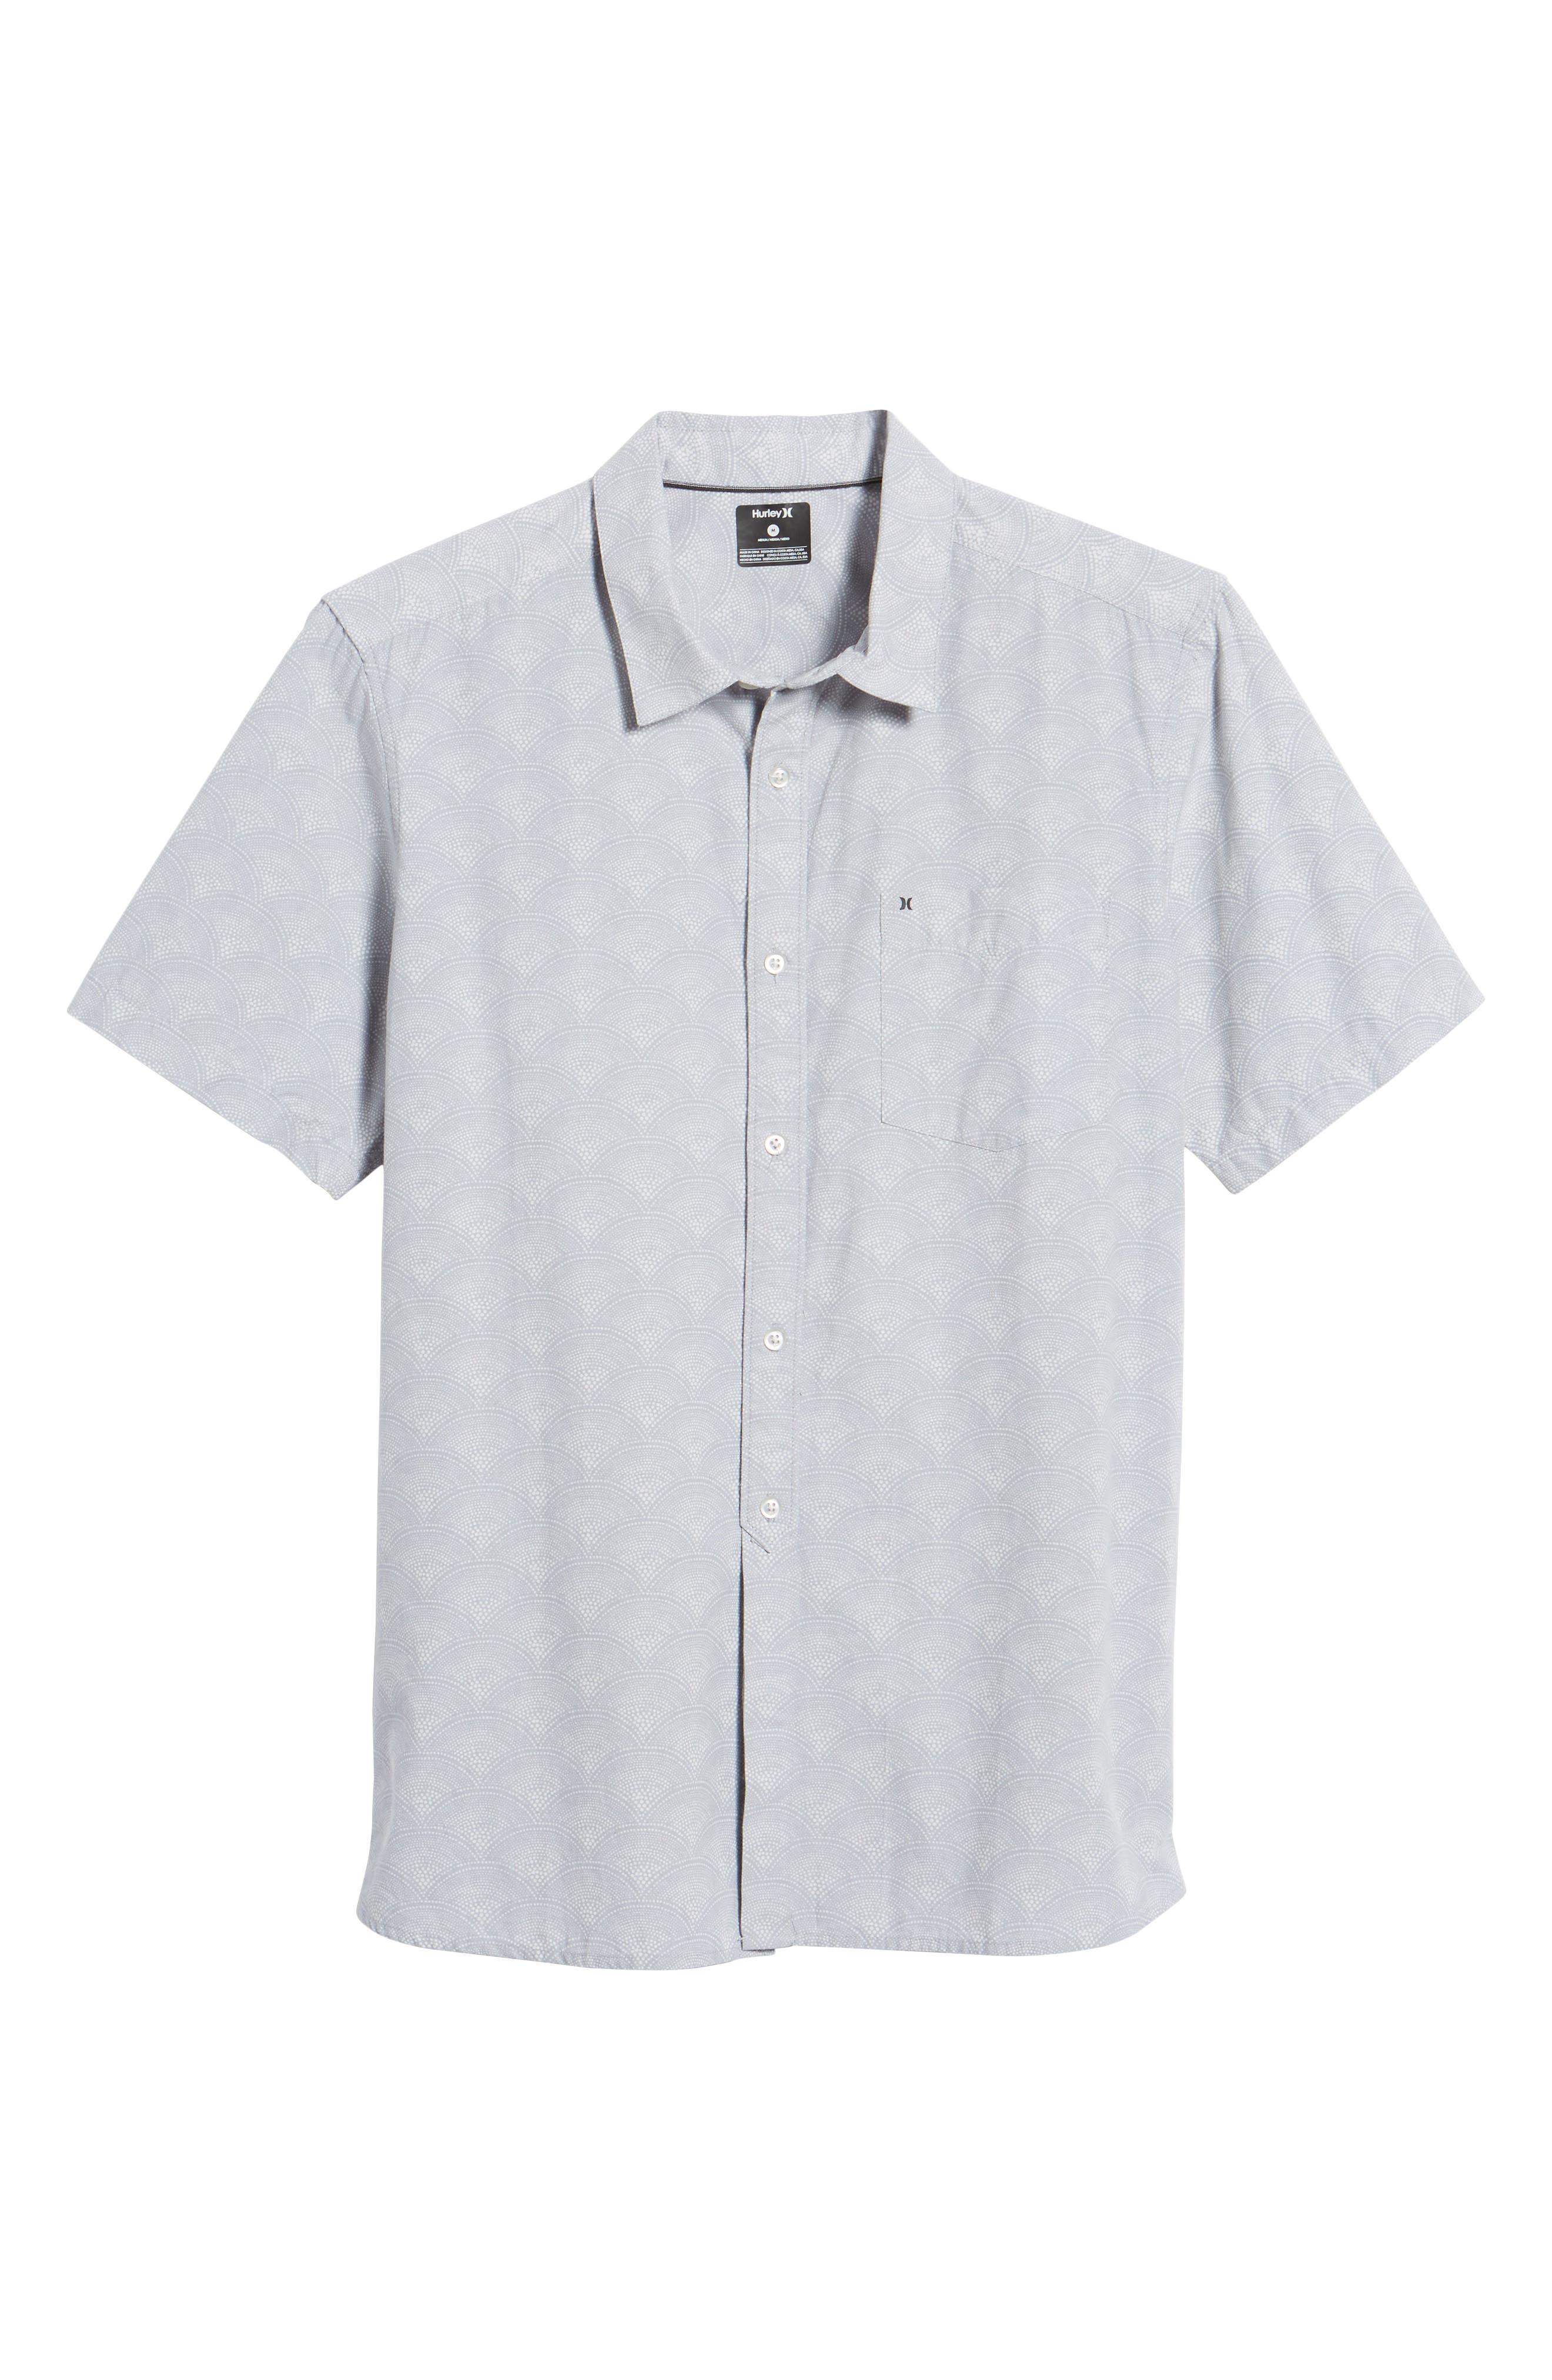 Pescado Short Sleeve Oxford Shirt,                             Alternate thumbnail 6, color,                             LIGHT PUMICE